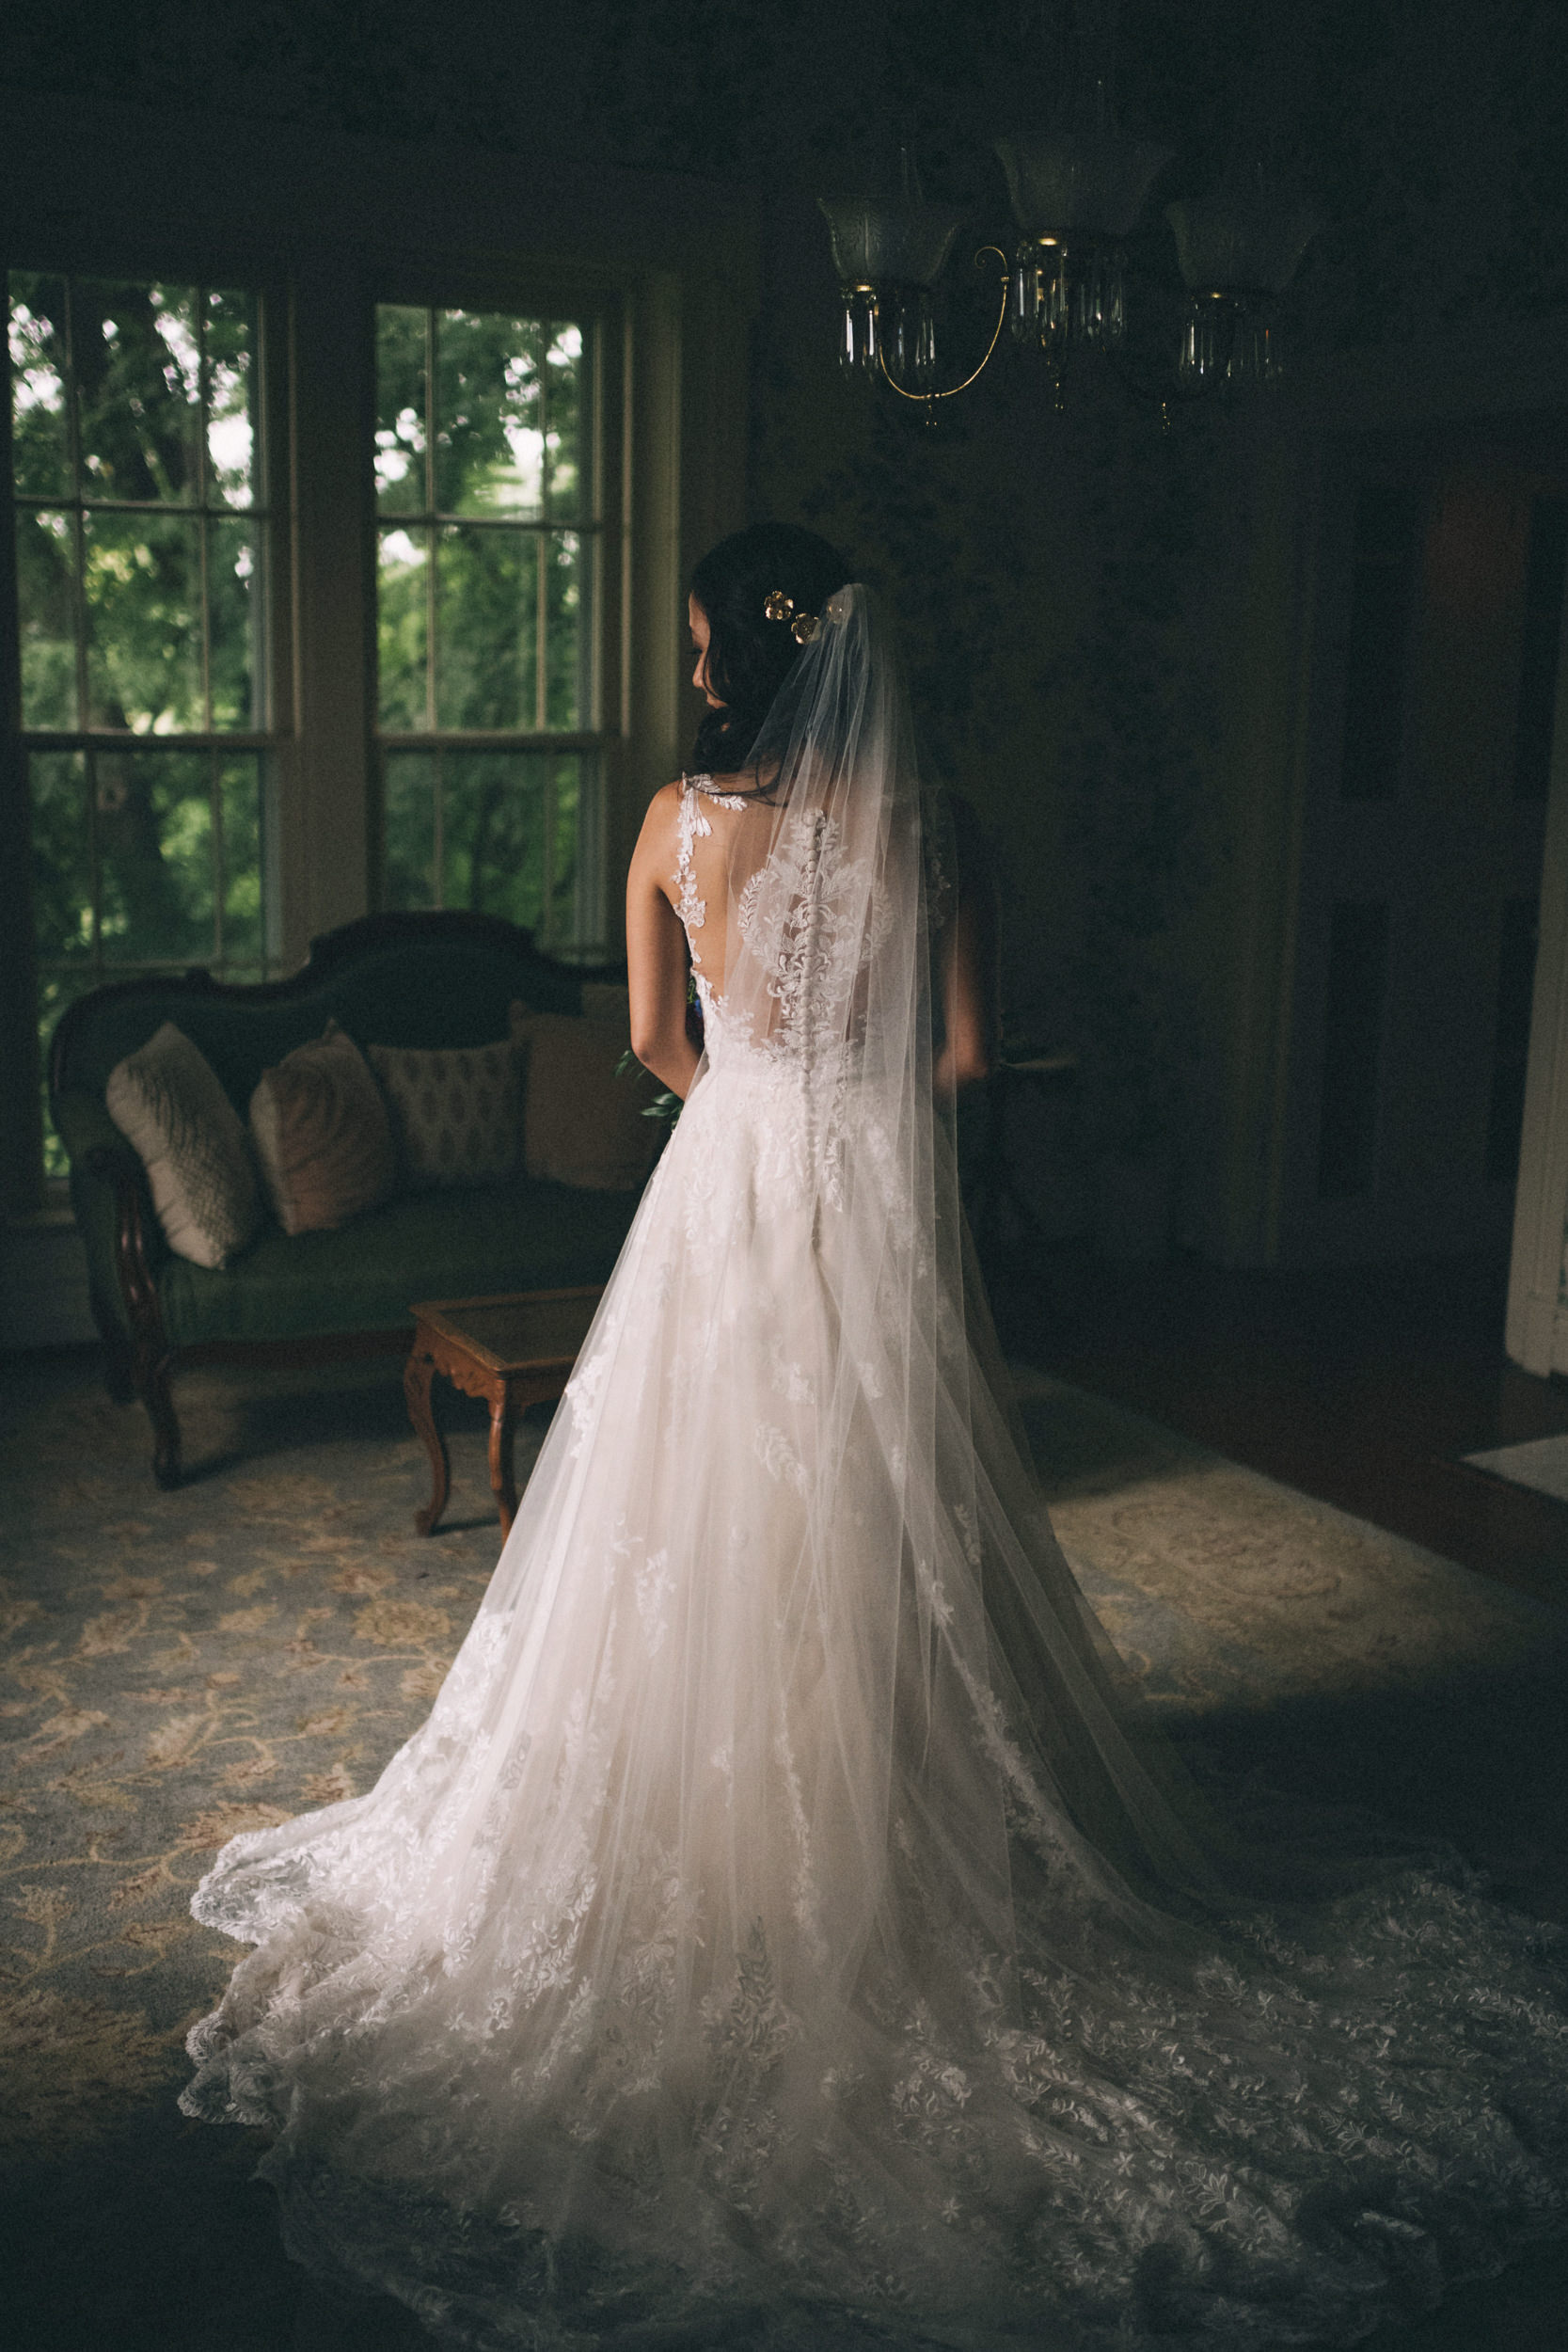 Louisville-Kentucky-Wedding-and-Elopement-Photographer-Sarah-Katherine-Davis-Photography-Summer-Jewel-Toned-Wedding-Chineese-Tea-Ceremony-Warrenwood-Manor-Danville-127.jpg